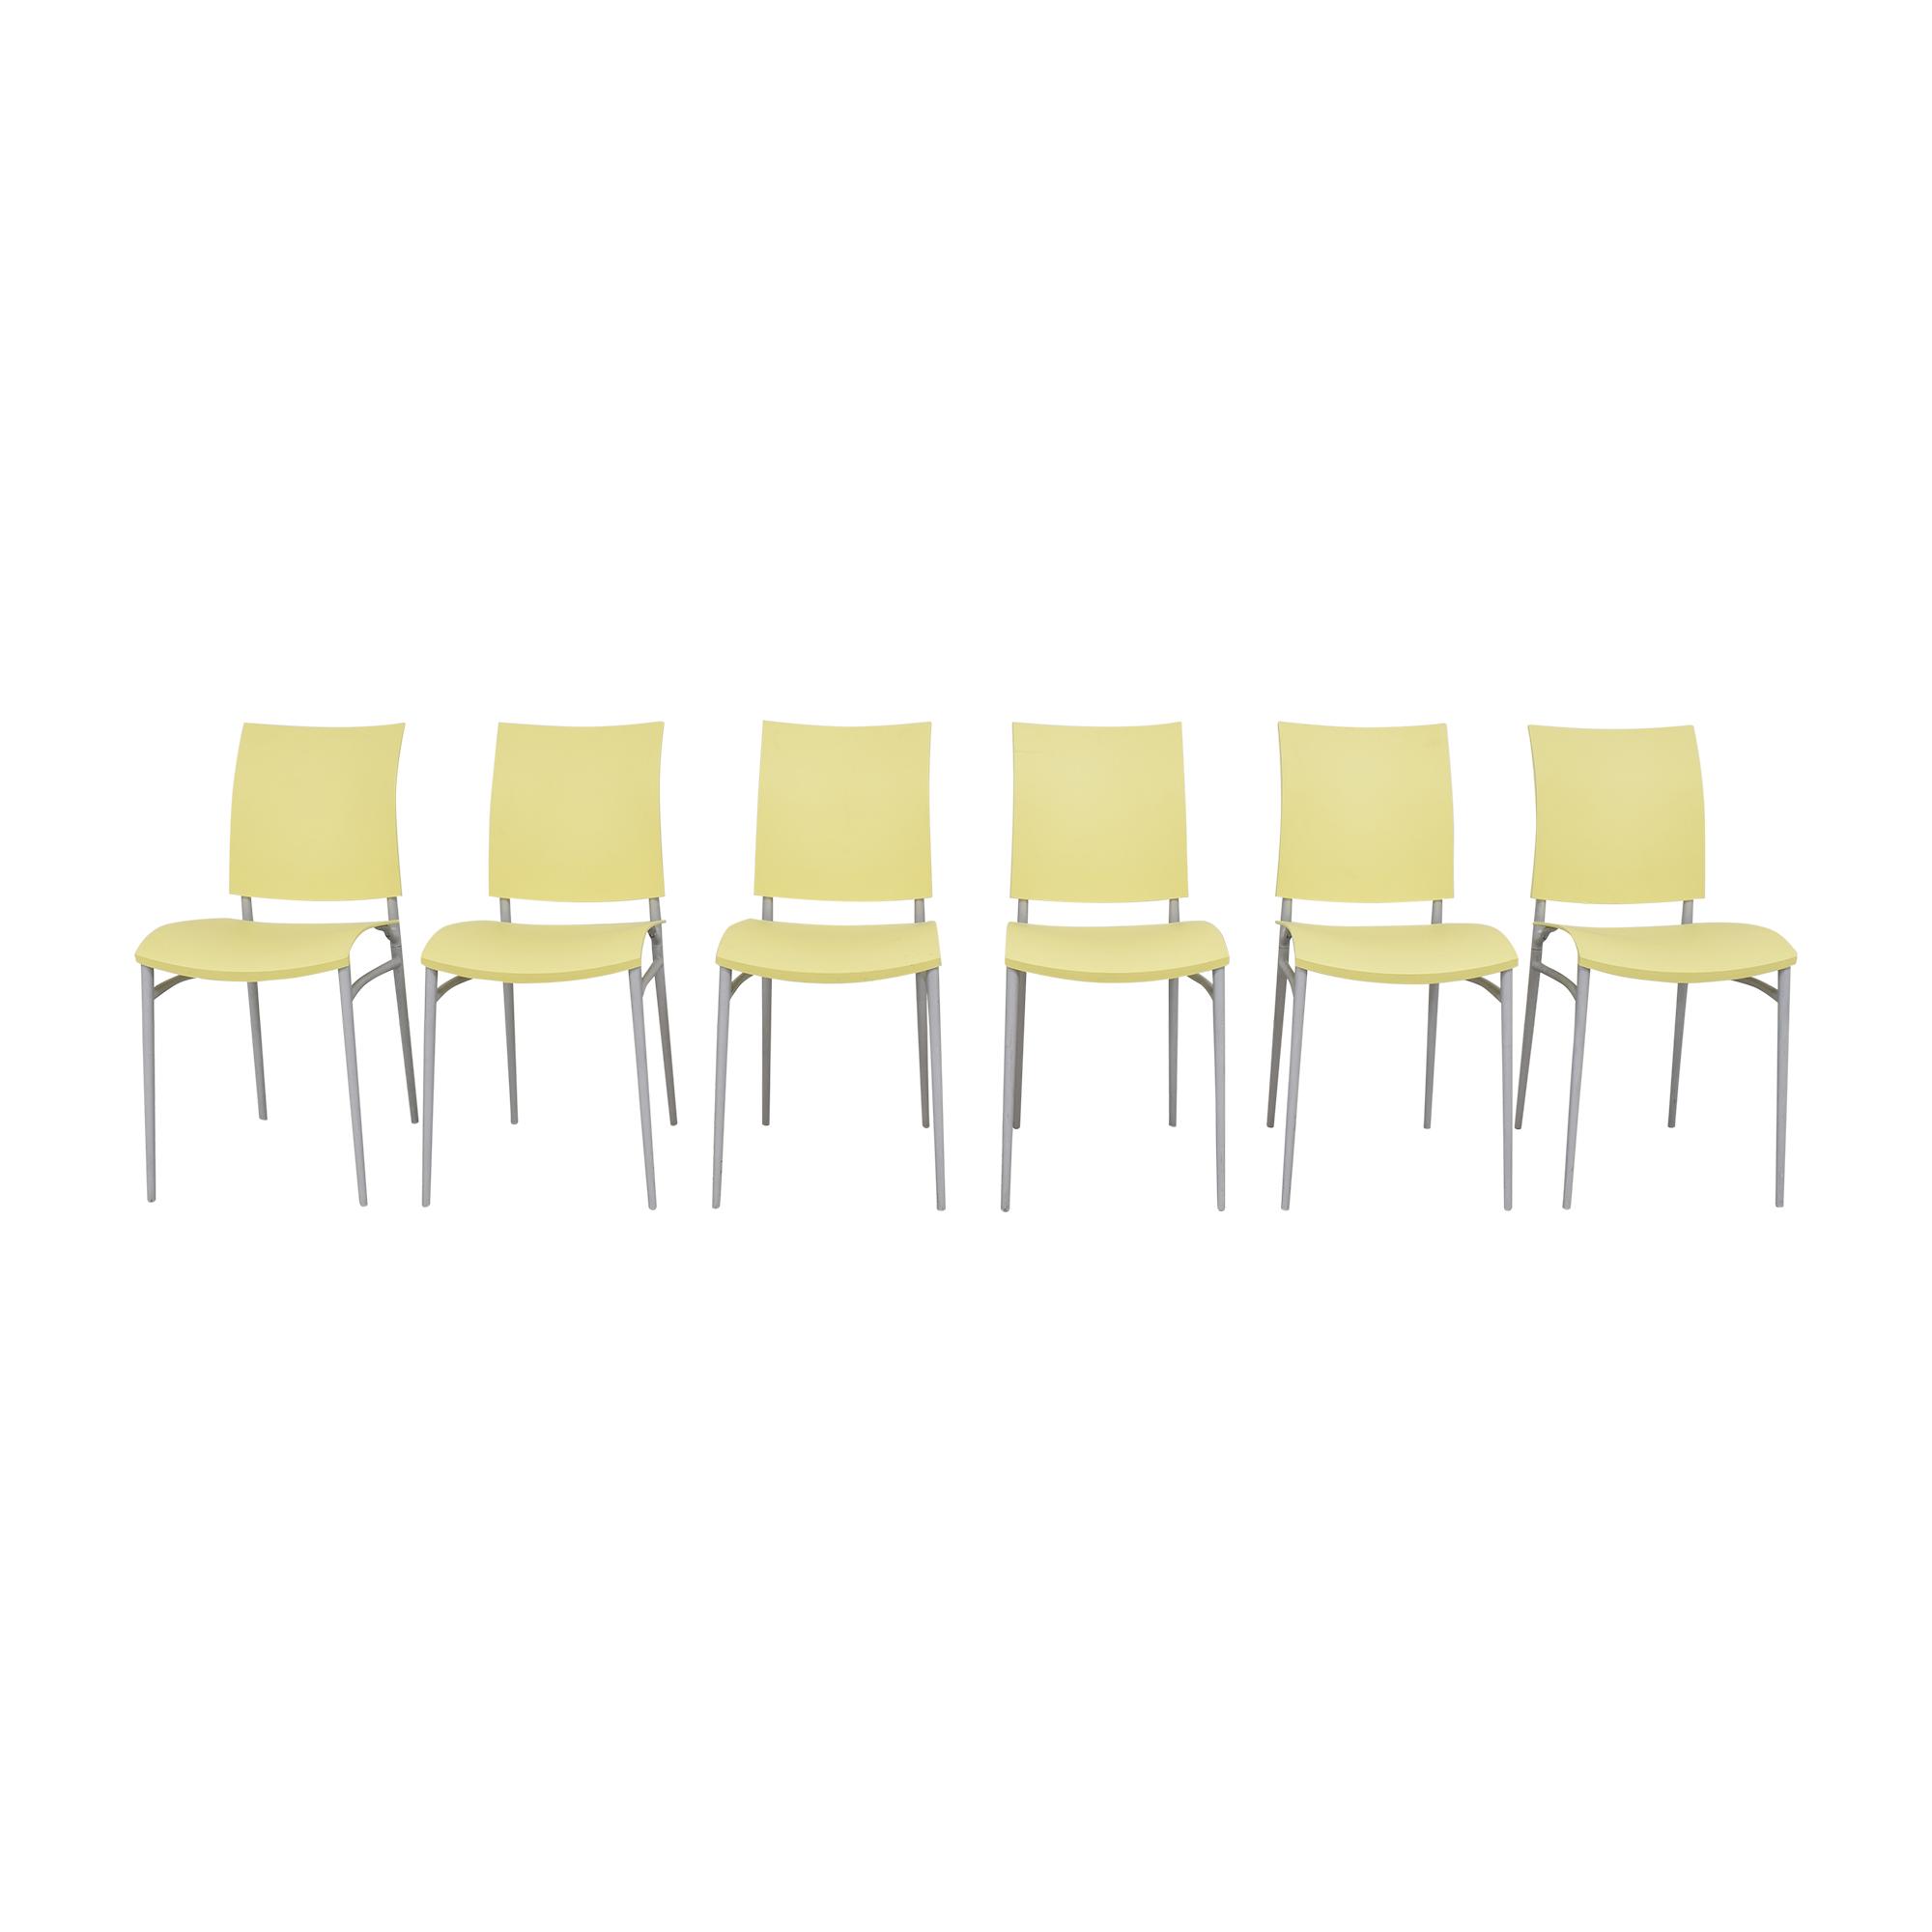 Cassina Cassina Miss C.O.C.O. Folding Chairs used